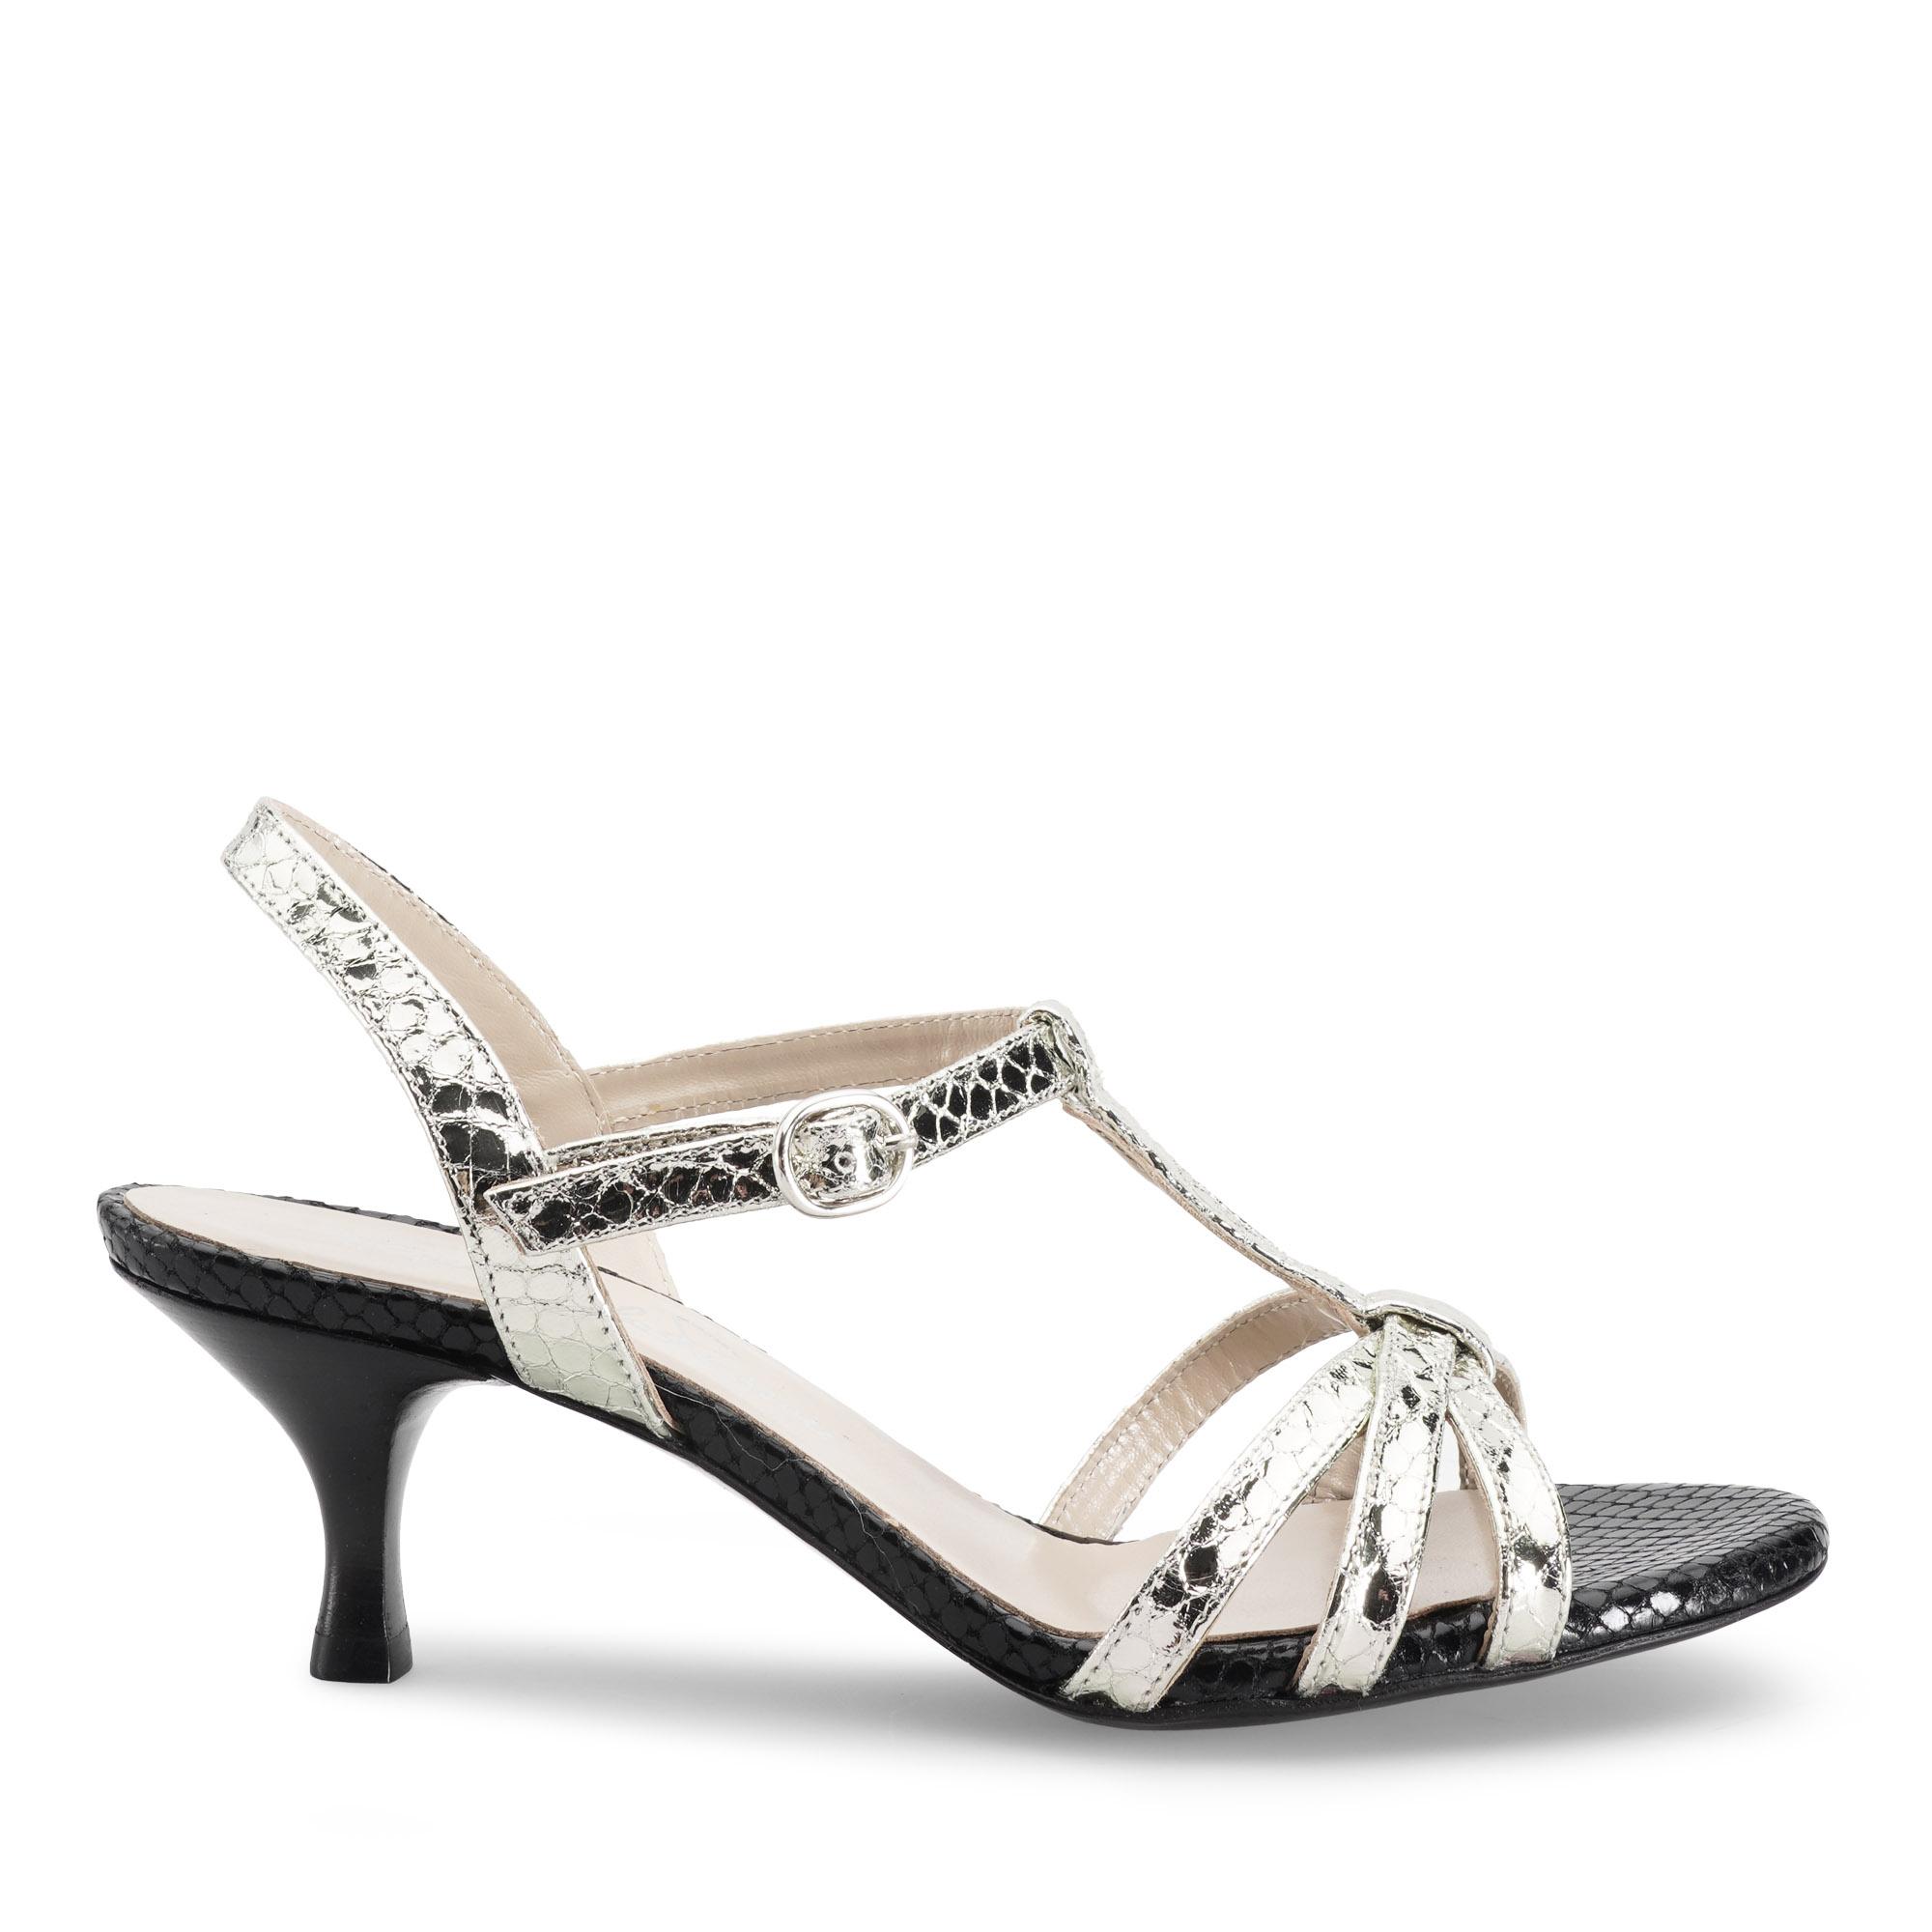 sandalo-donna-platino-nero-pitone-emanuela-passeri-shoes-hells-spring-summer-2021